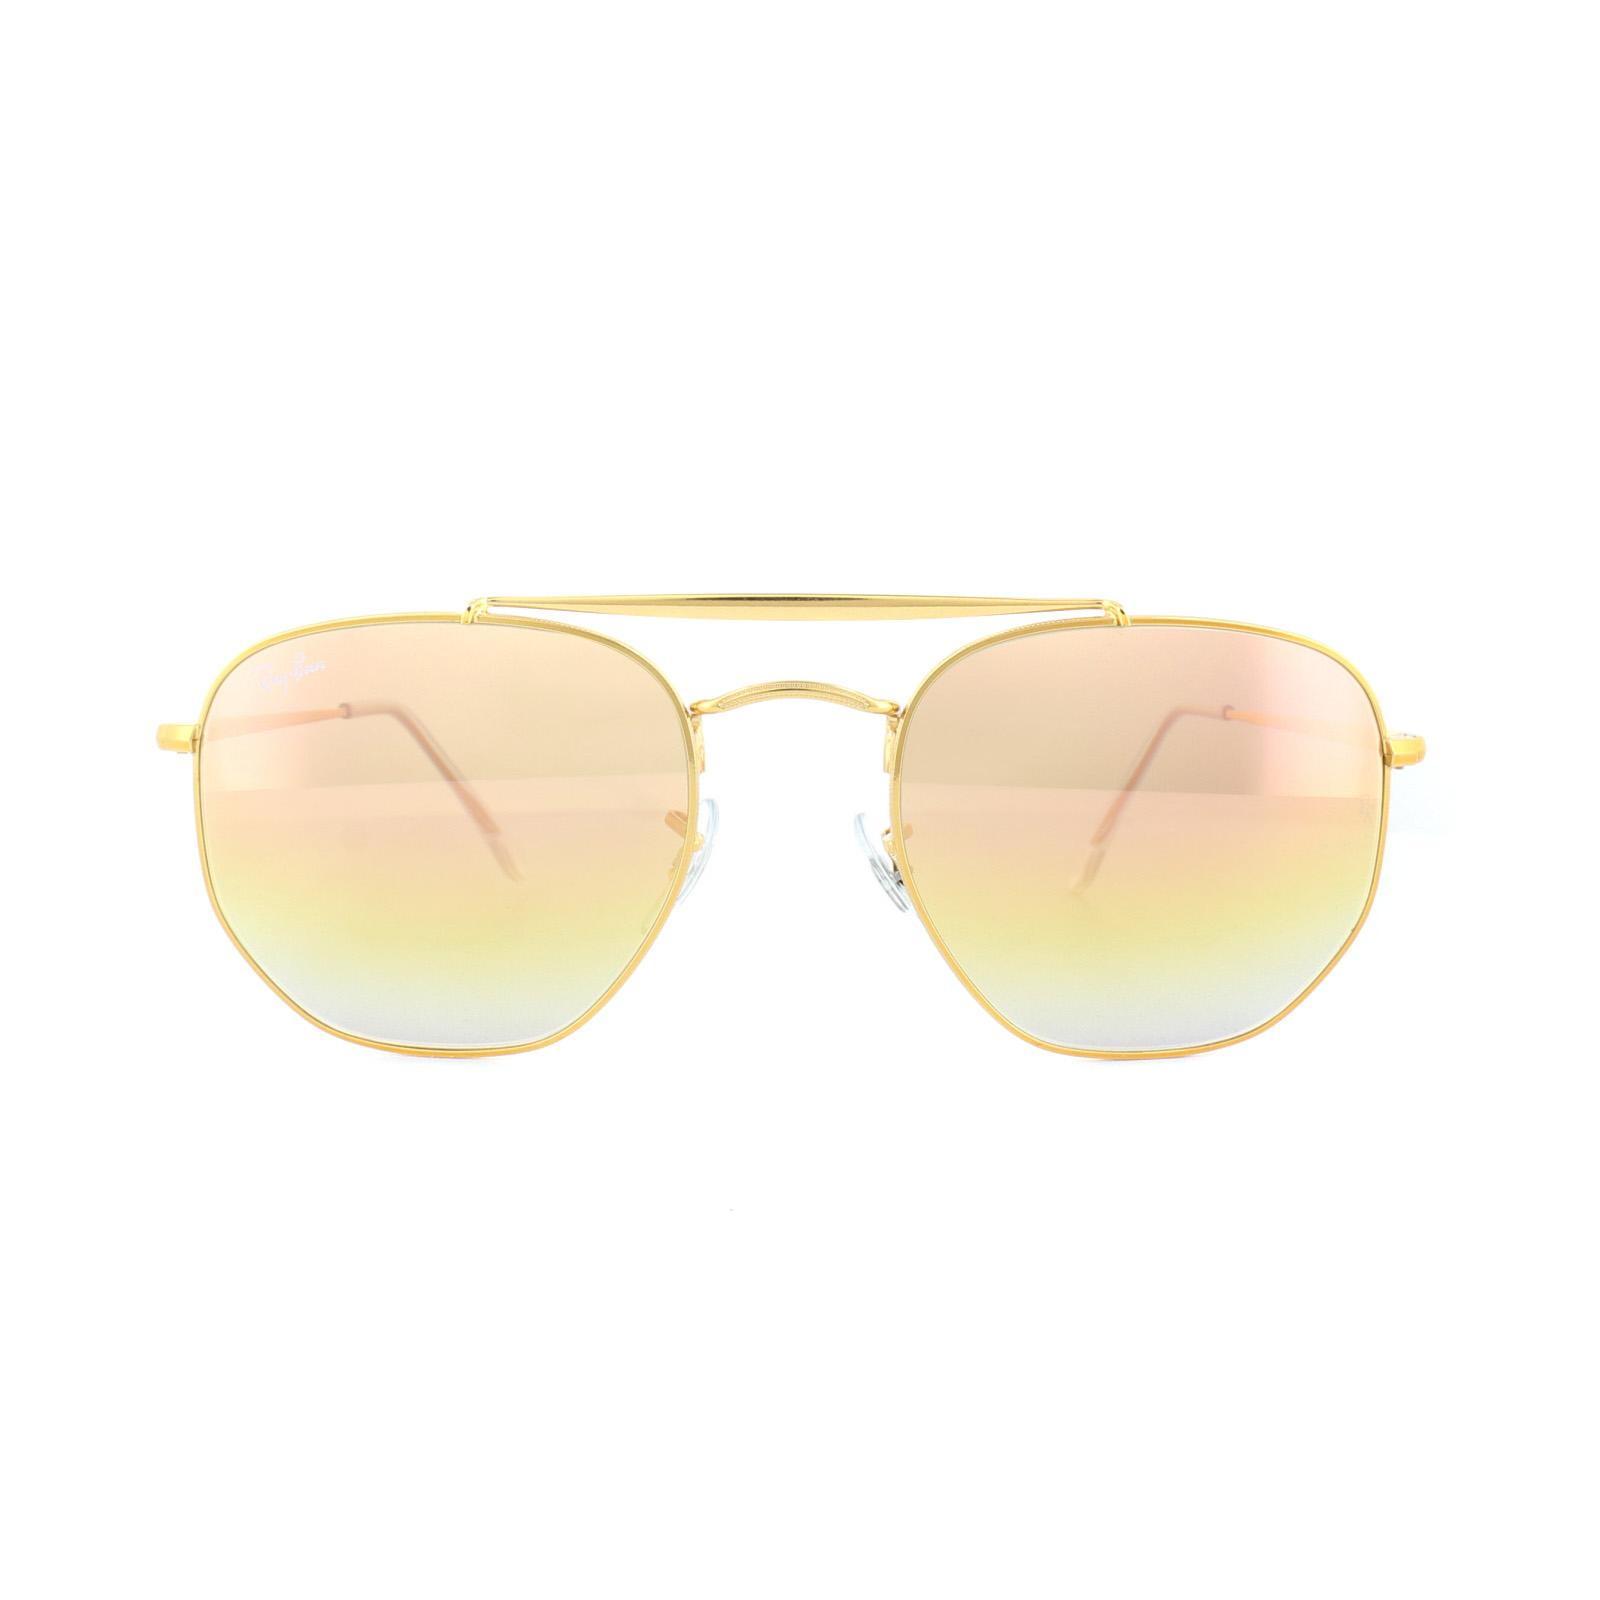 42d783fbca17b Sentinel Ray-Ban Sunglasses Marshal 3648 9001I1 Bronze Copper Pink Gradient  Mirror